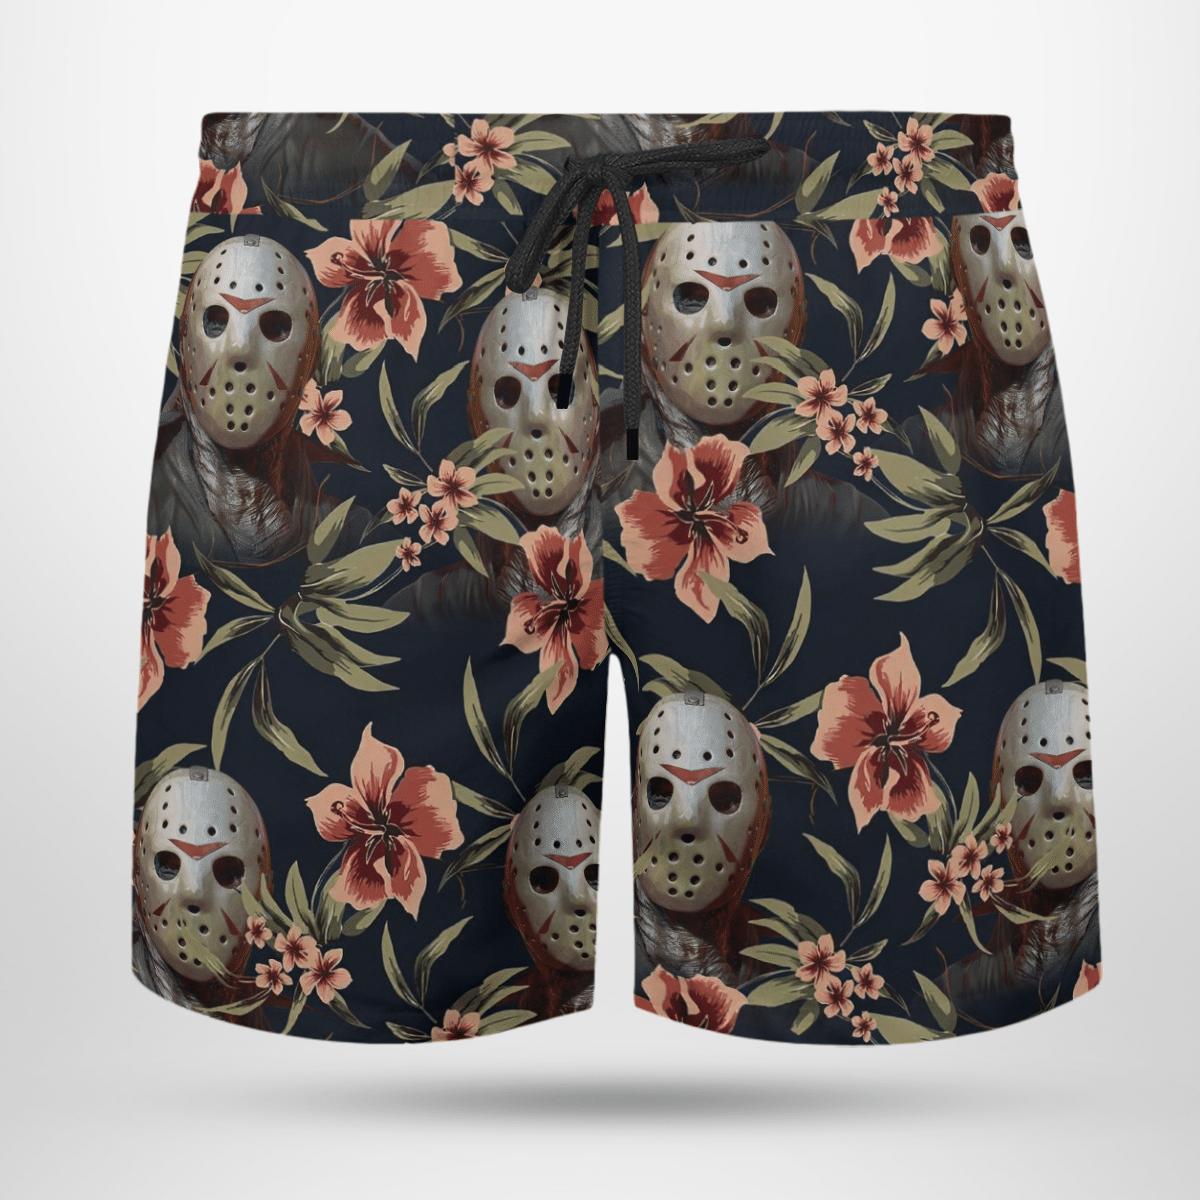 Jason Voorhees Hawaii shirt and short 3